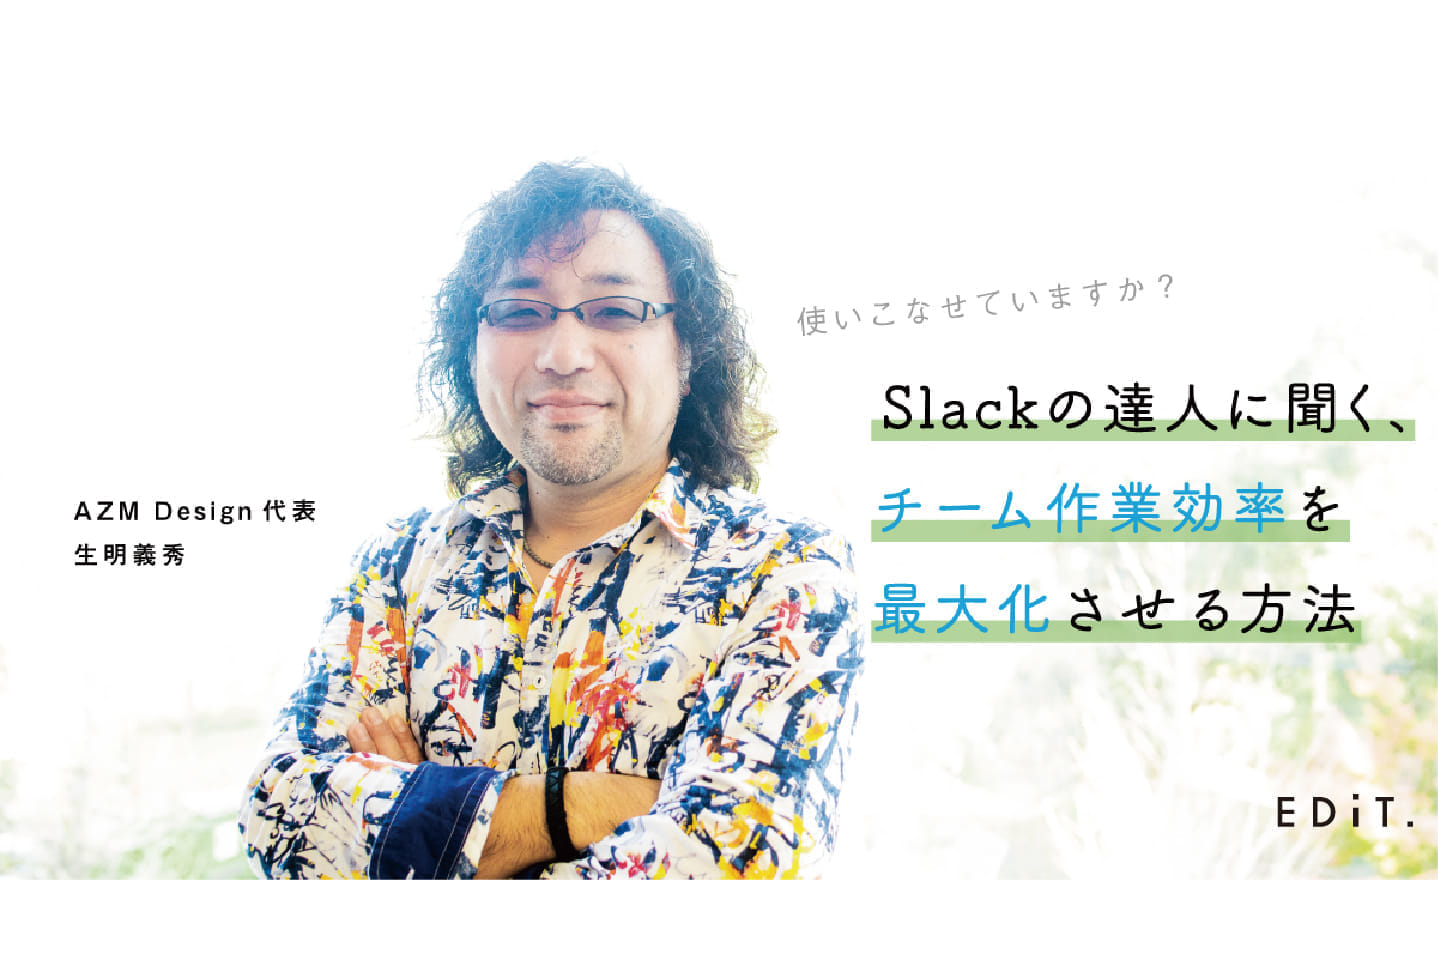 Slackの達人に聞く、チーム作業効率を最大化させる方法